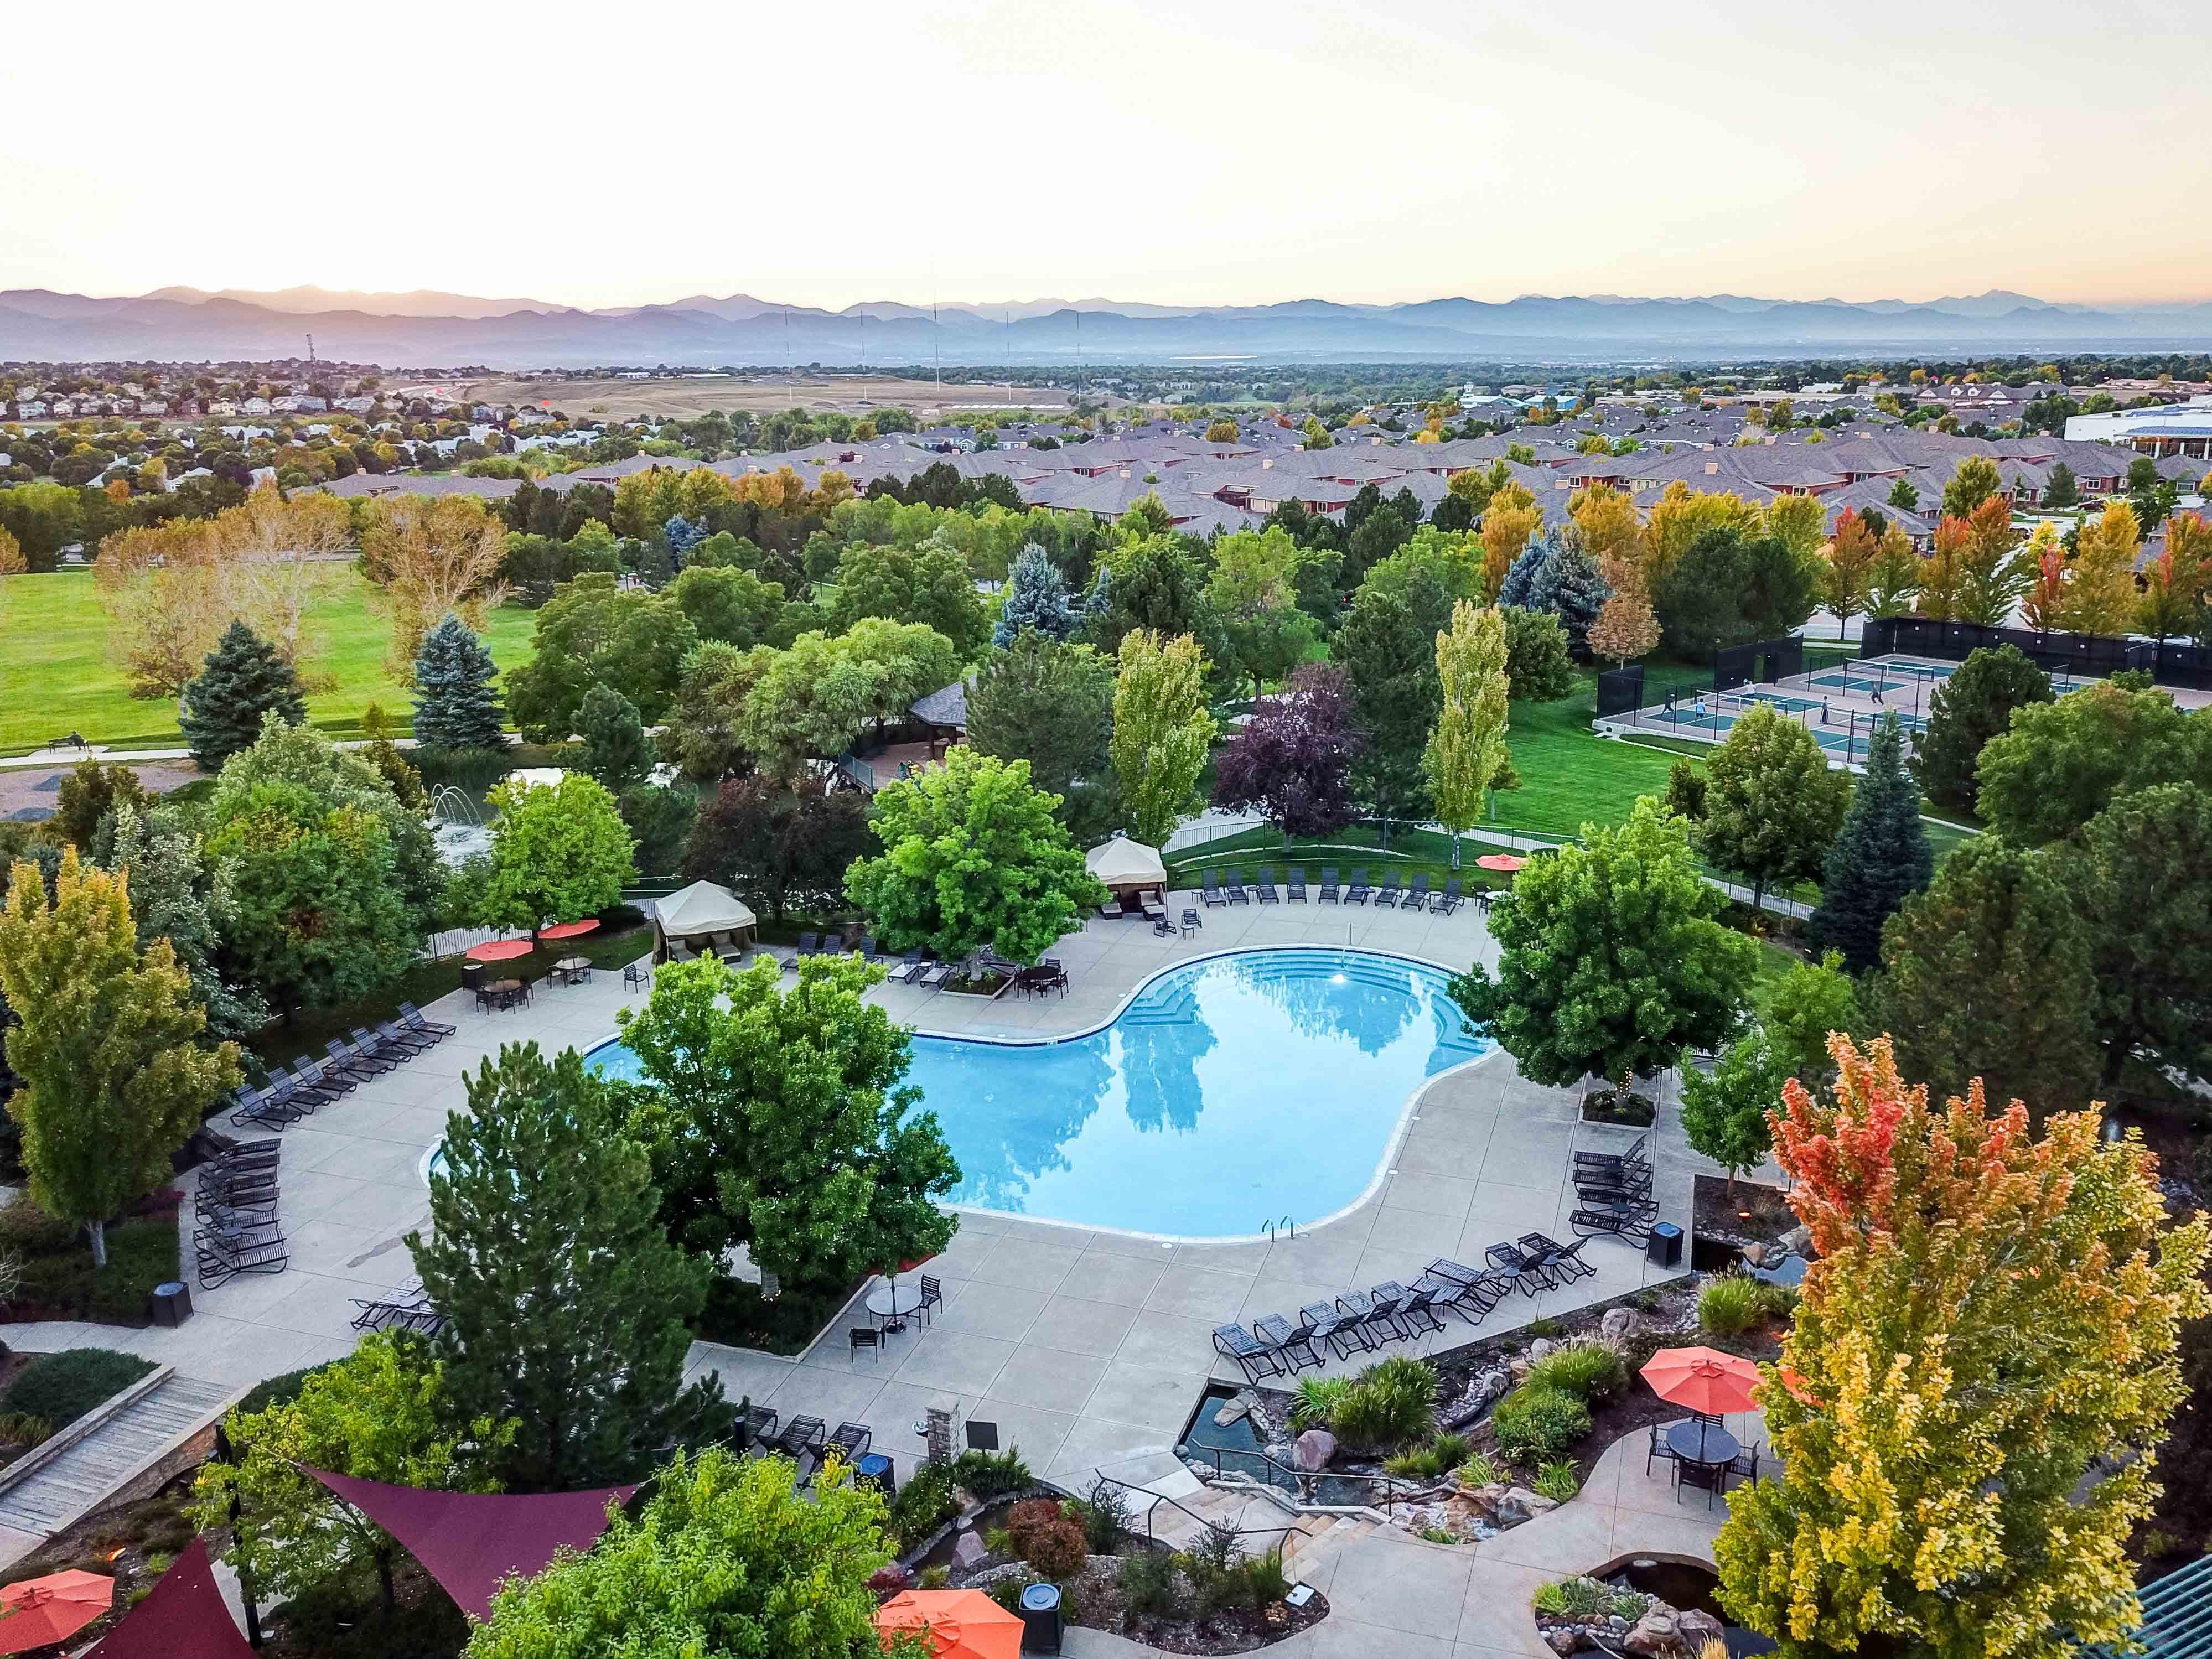 Palomino Park Resort for rent